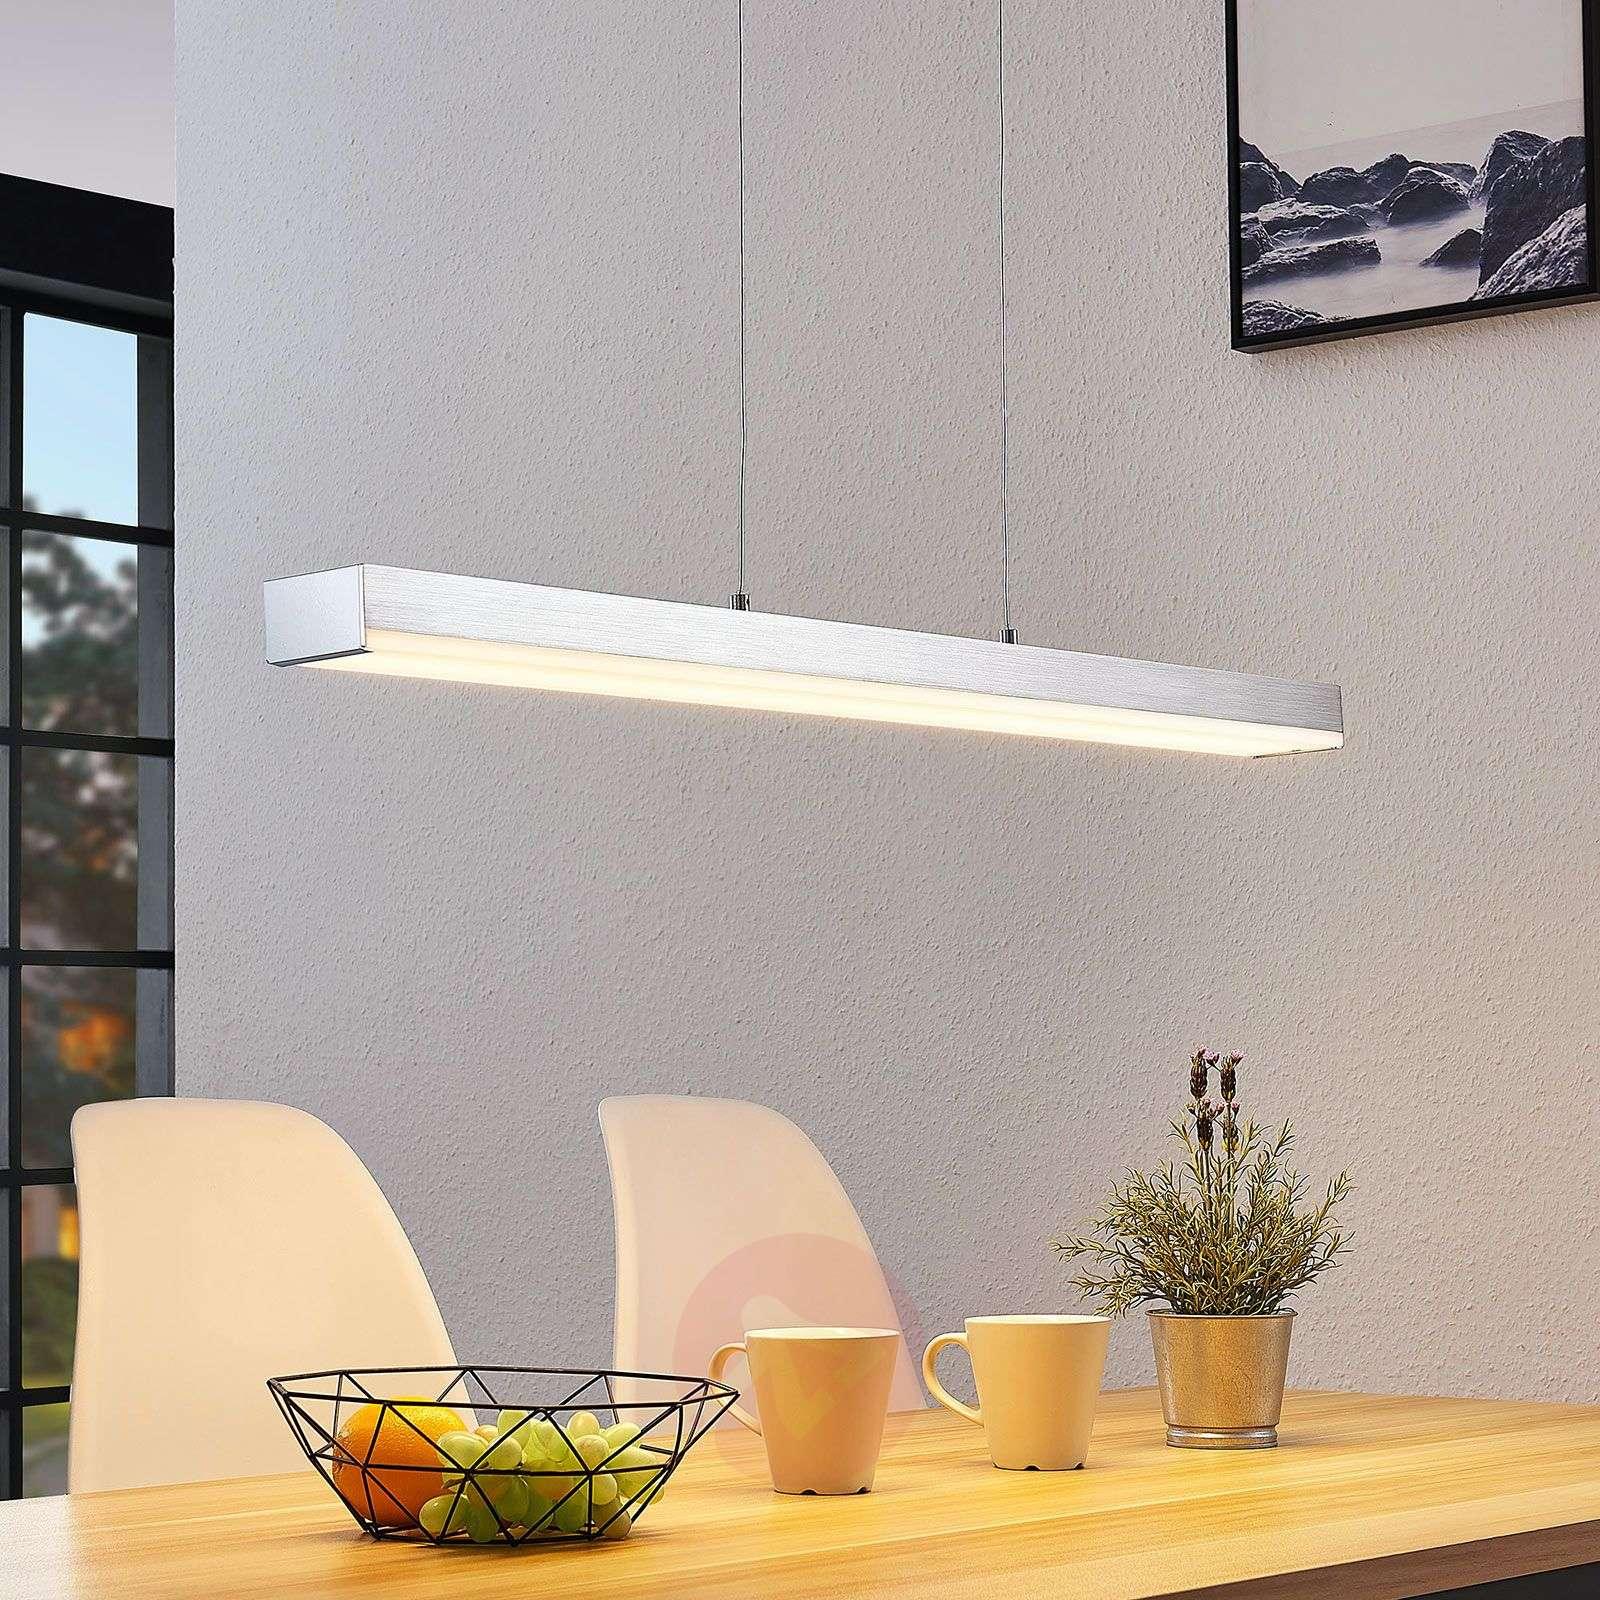 LED-riippuvalo Keyan WiZ kulmikas pitkä nikkeli-8032180-02